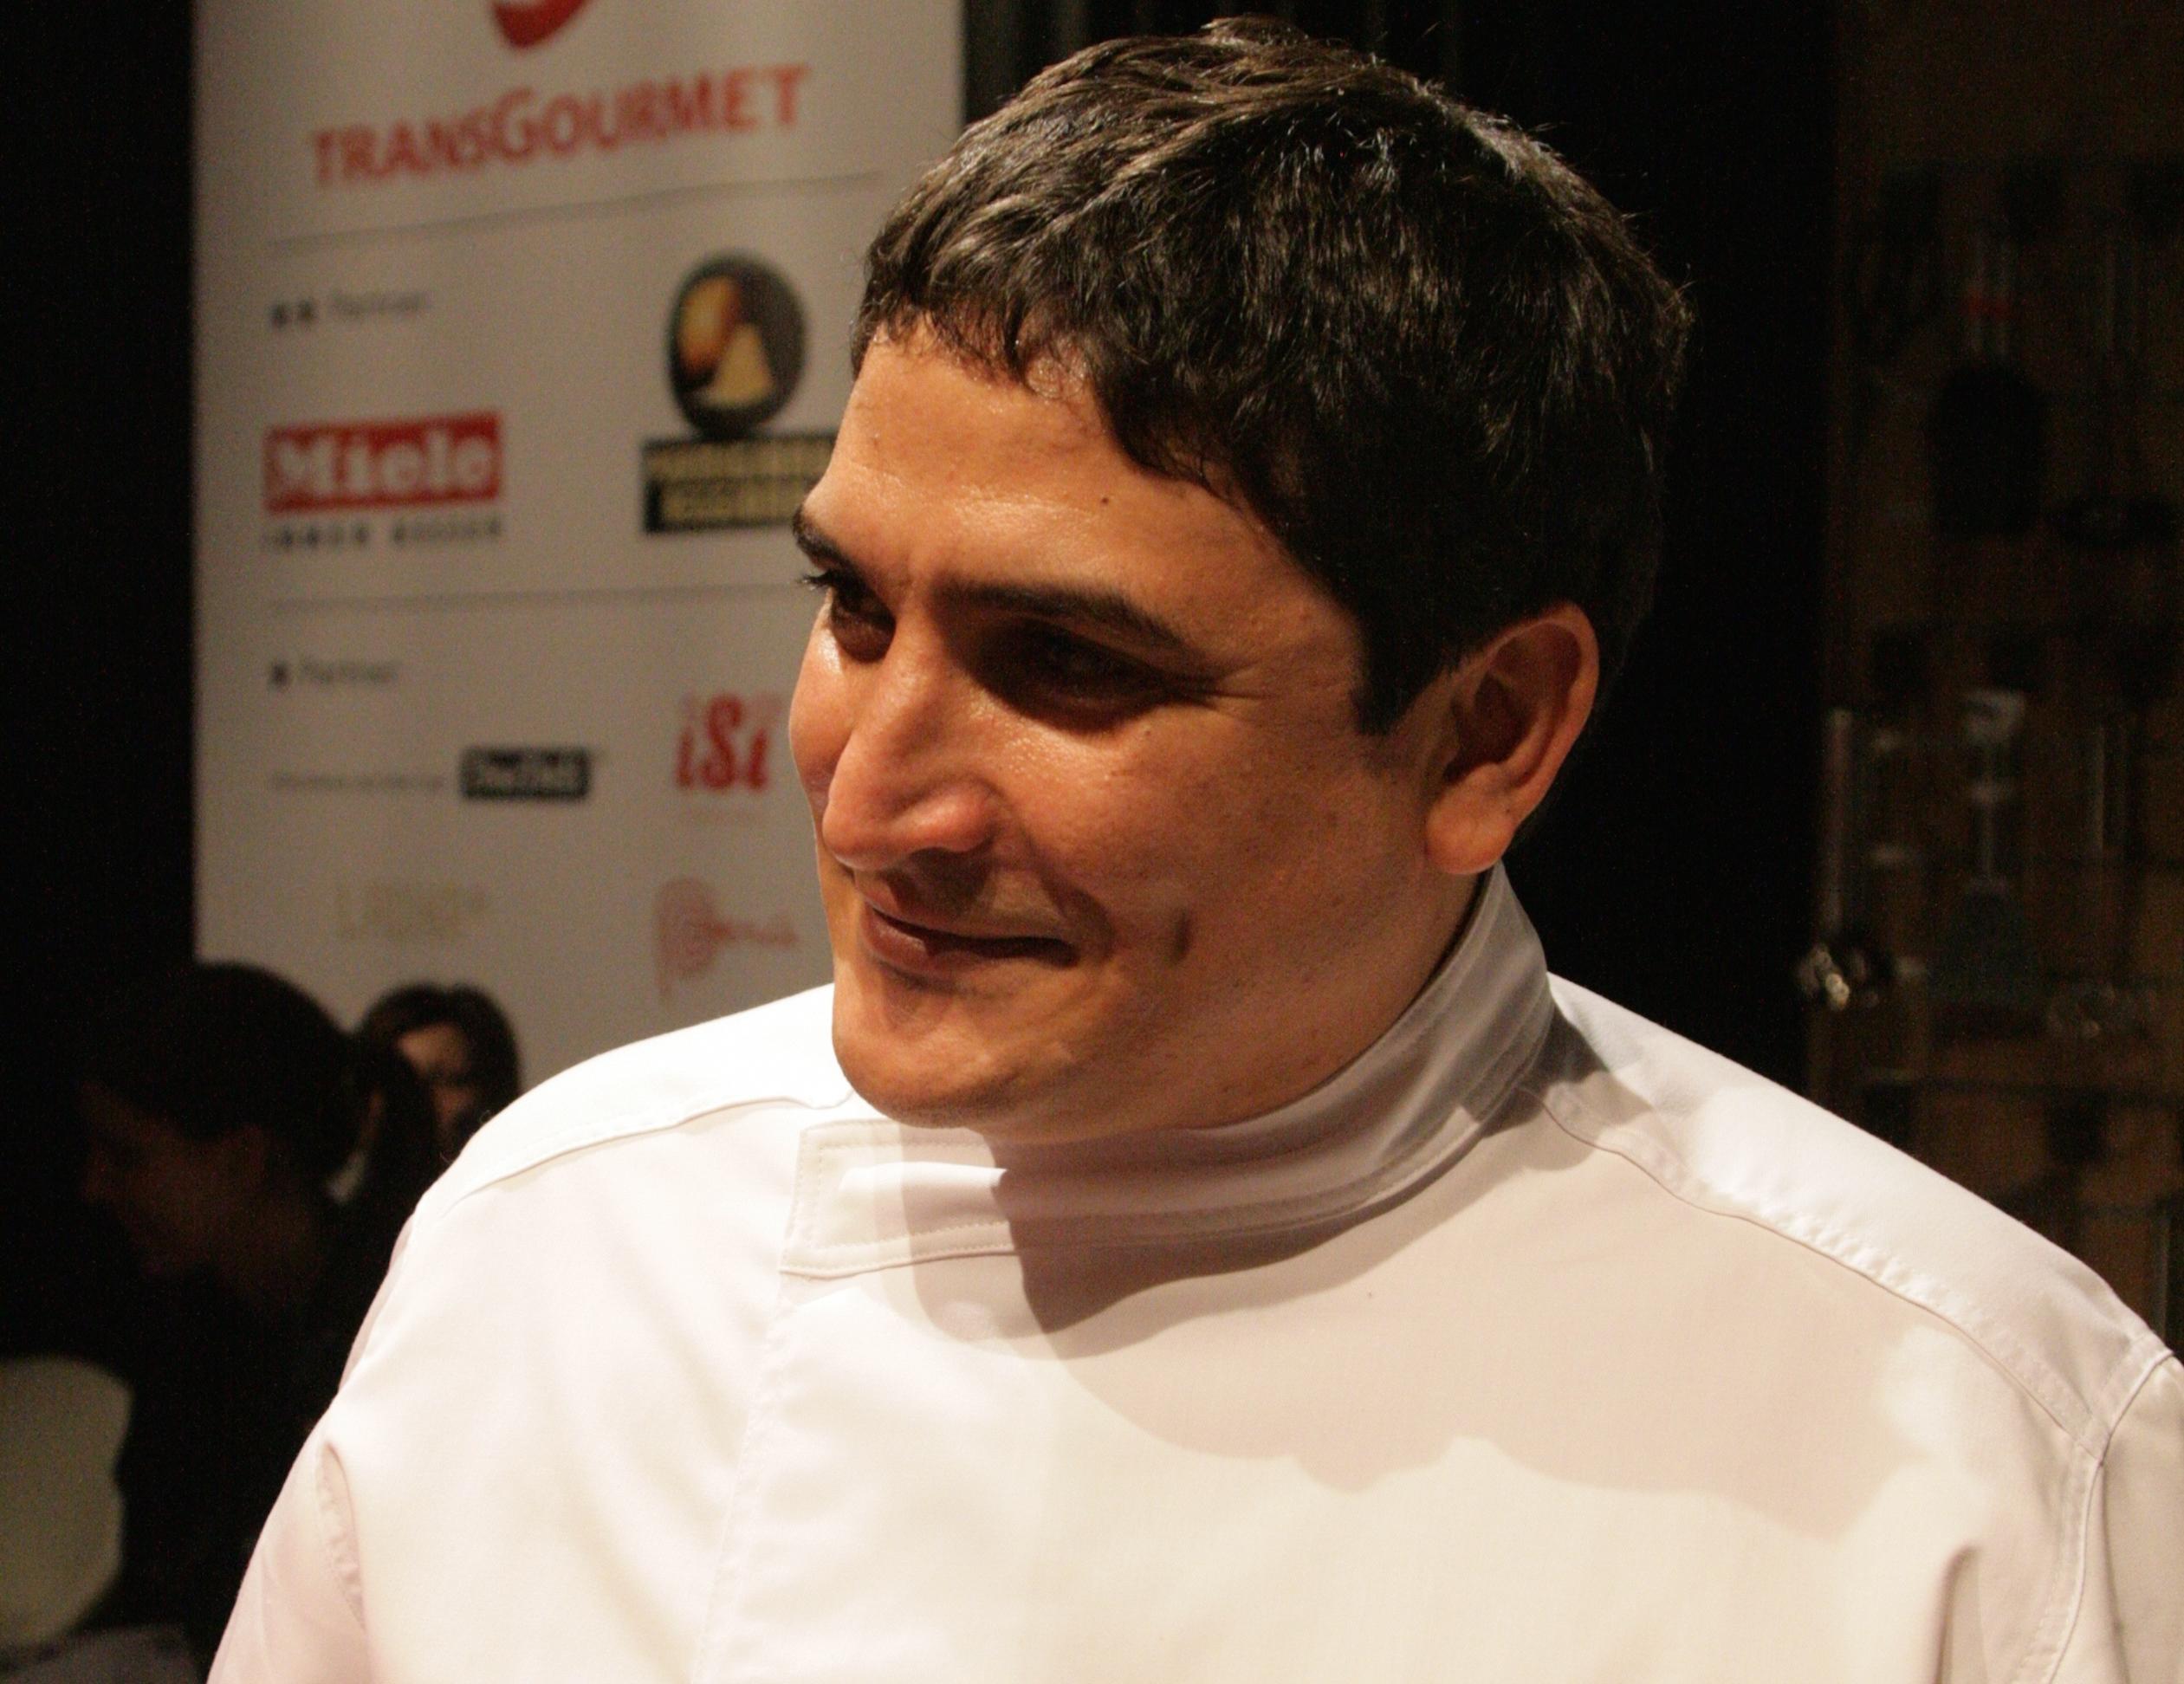 Mauro Colagreco (Mirazur) Showcases Three Great Dishes Using Collagen